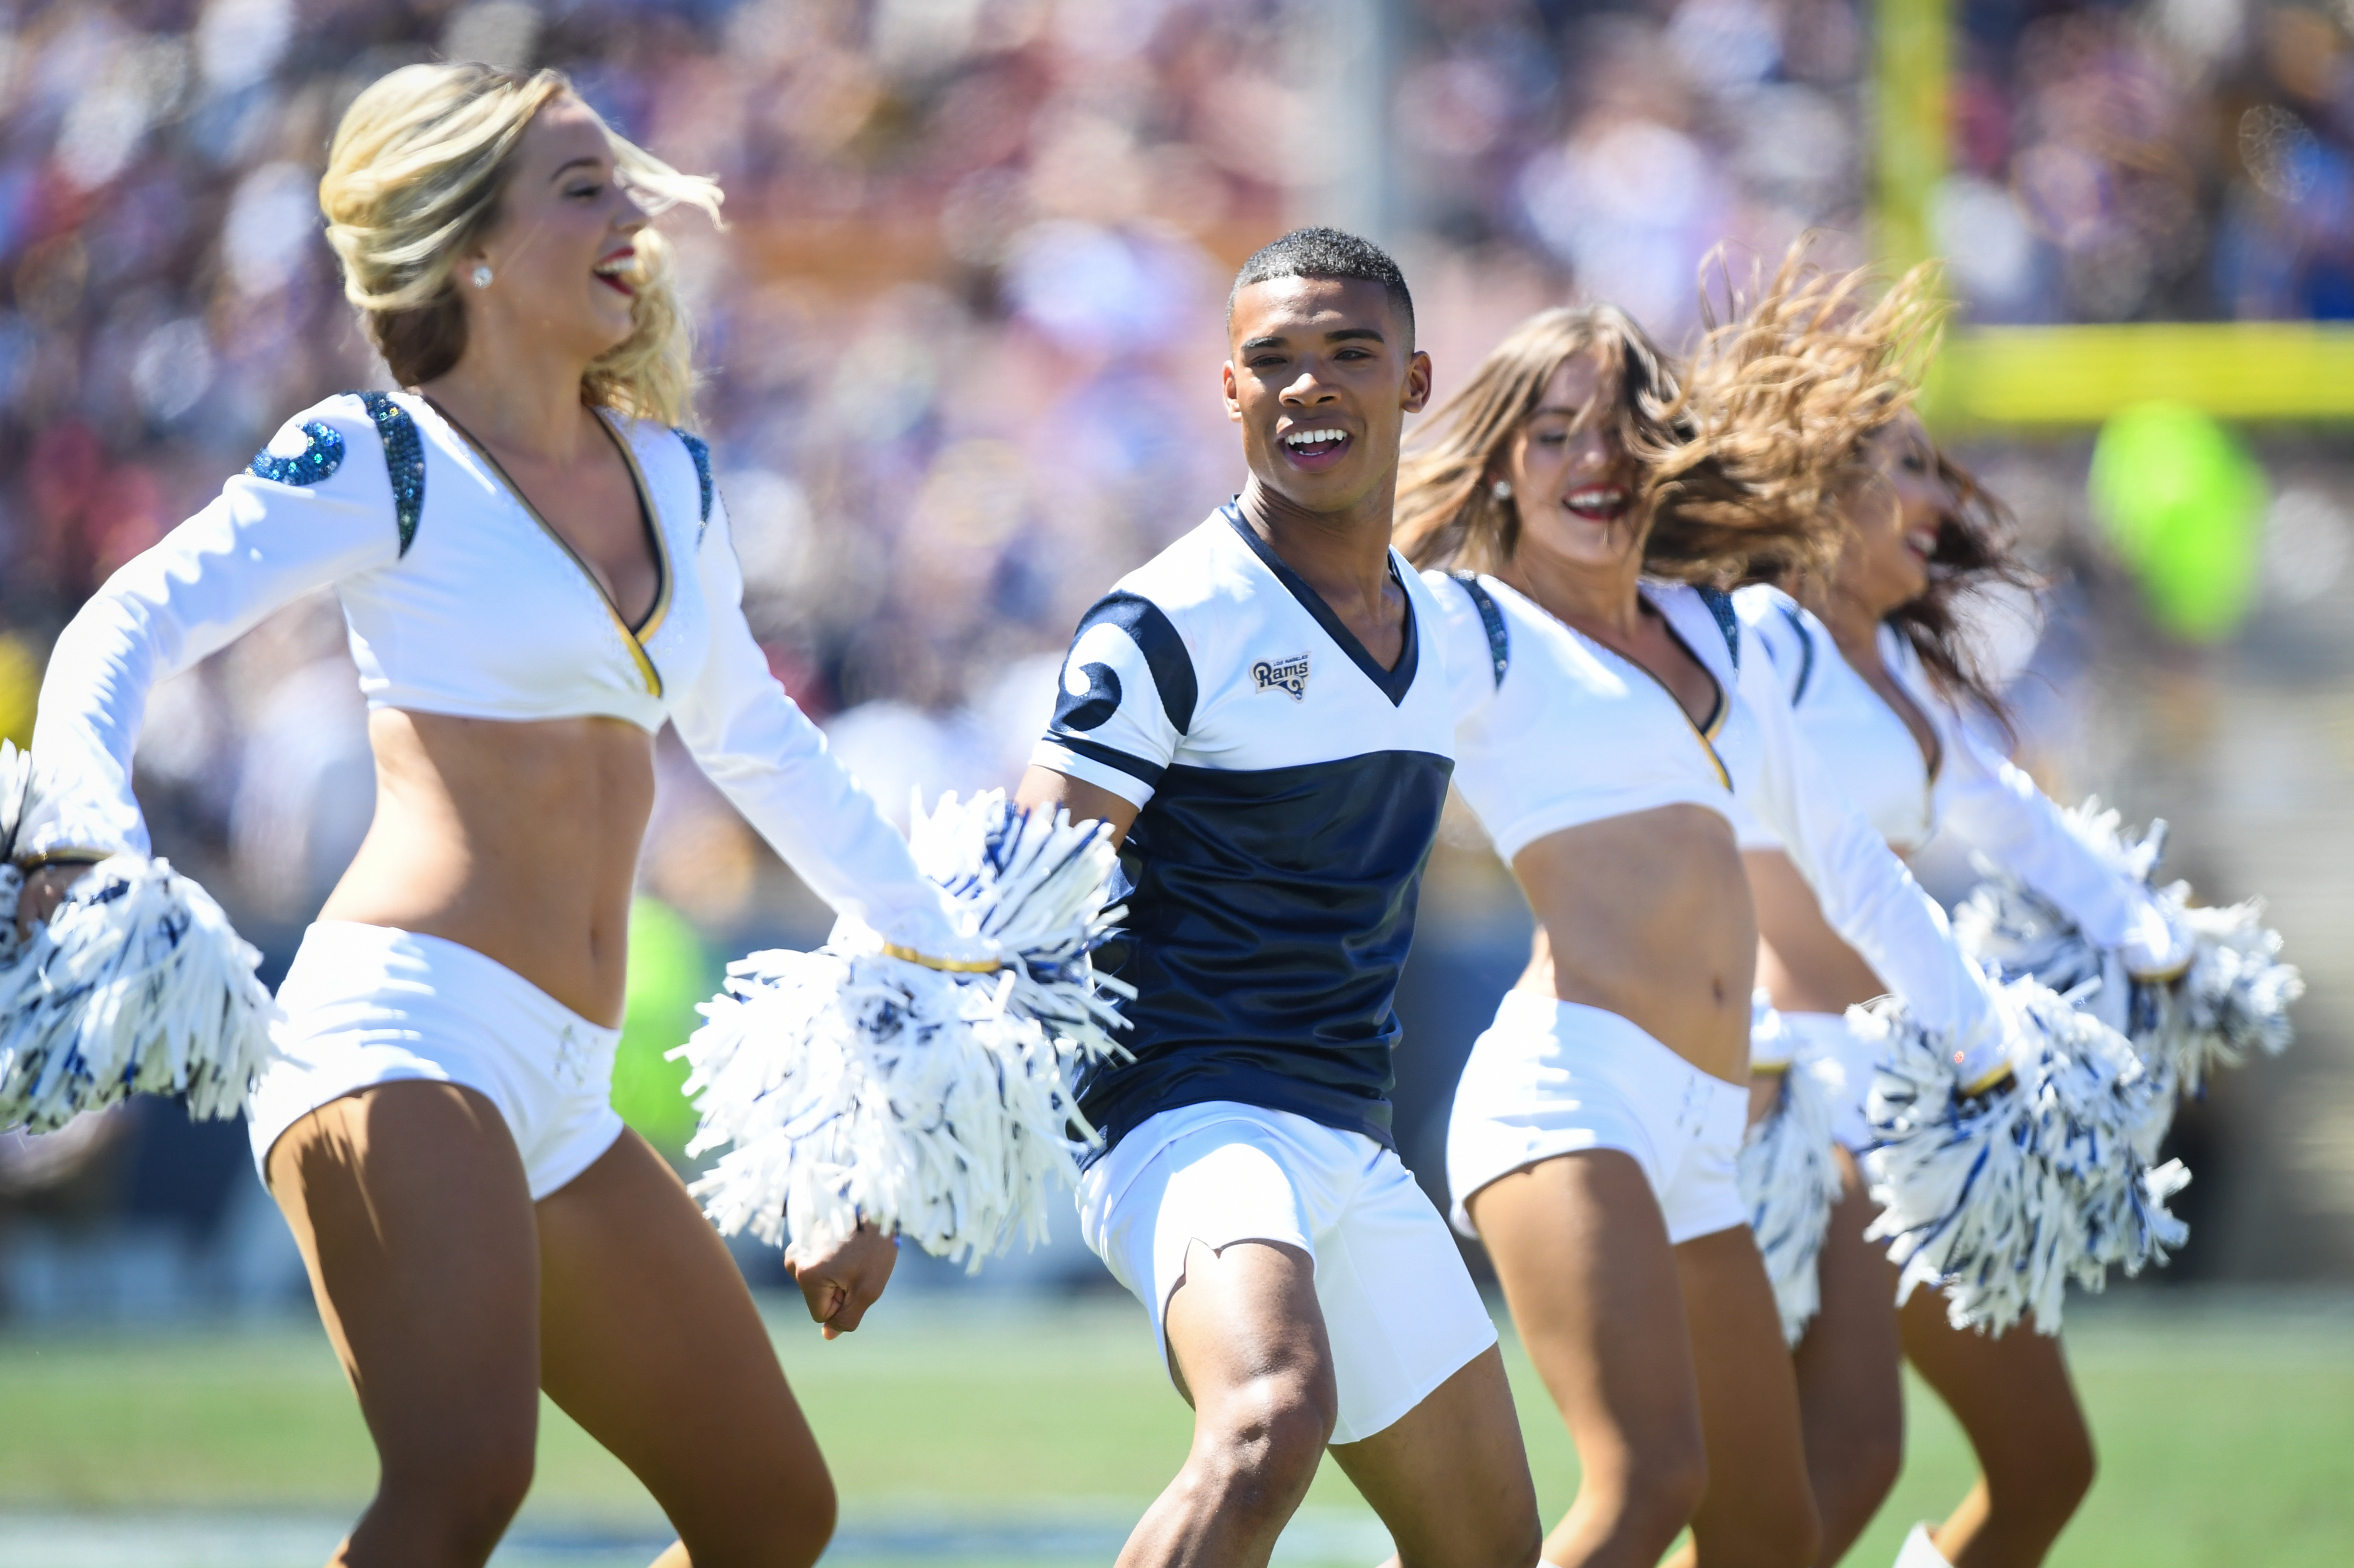 2 NFL Male LA Rams Cheerleaders Will Make Football History In Super Bowl  Game : NPR